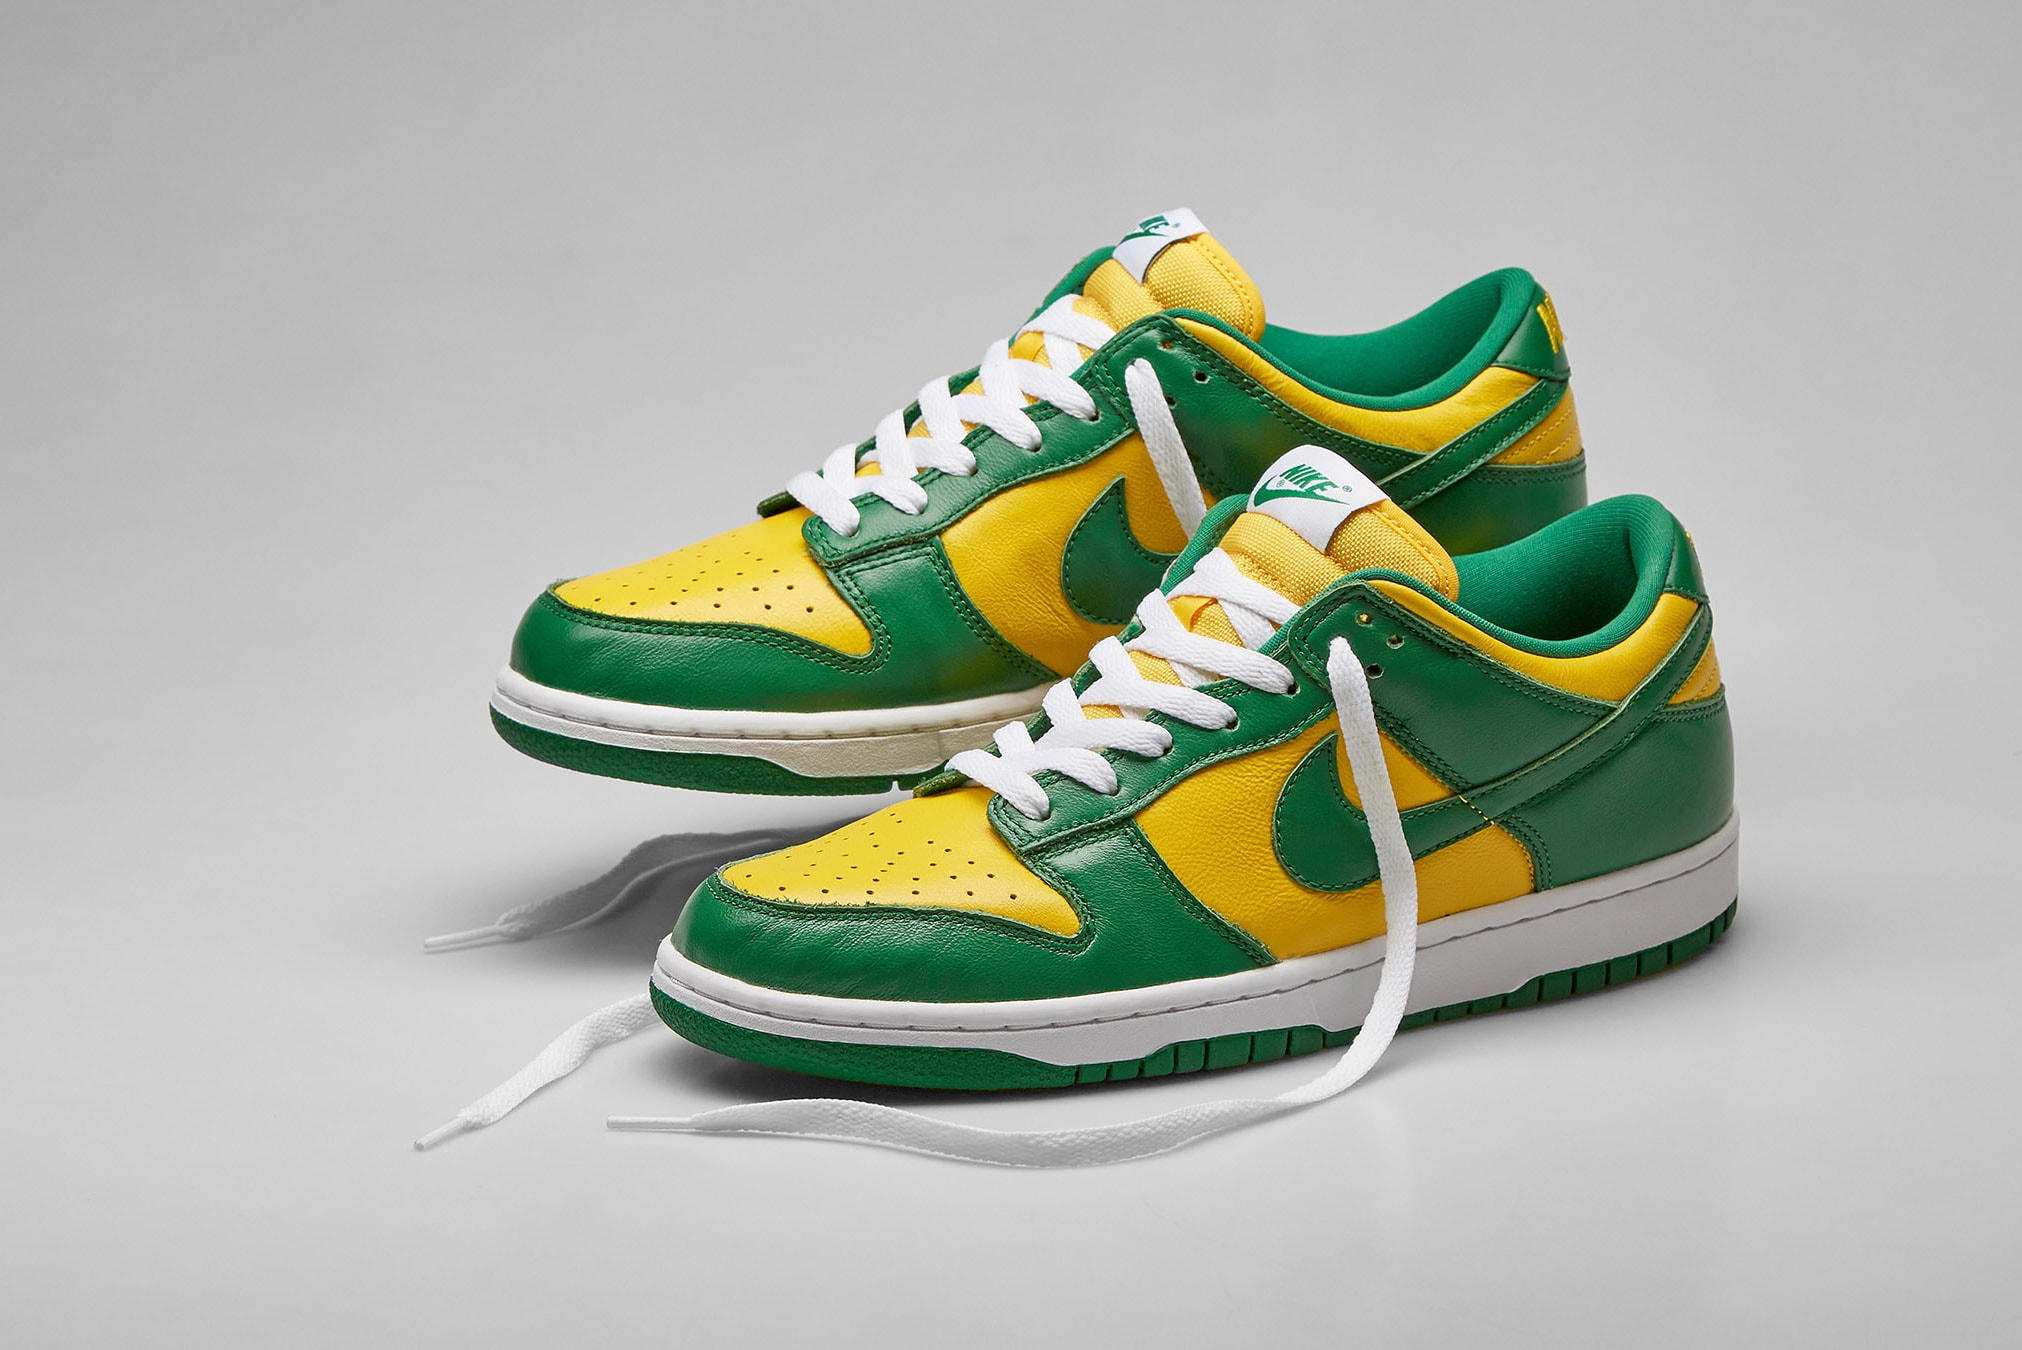 Prueba Constitución Puro  END. Features | Nike Dunk Low SP - Register Now on END. Launches